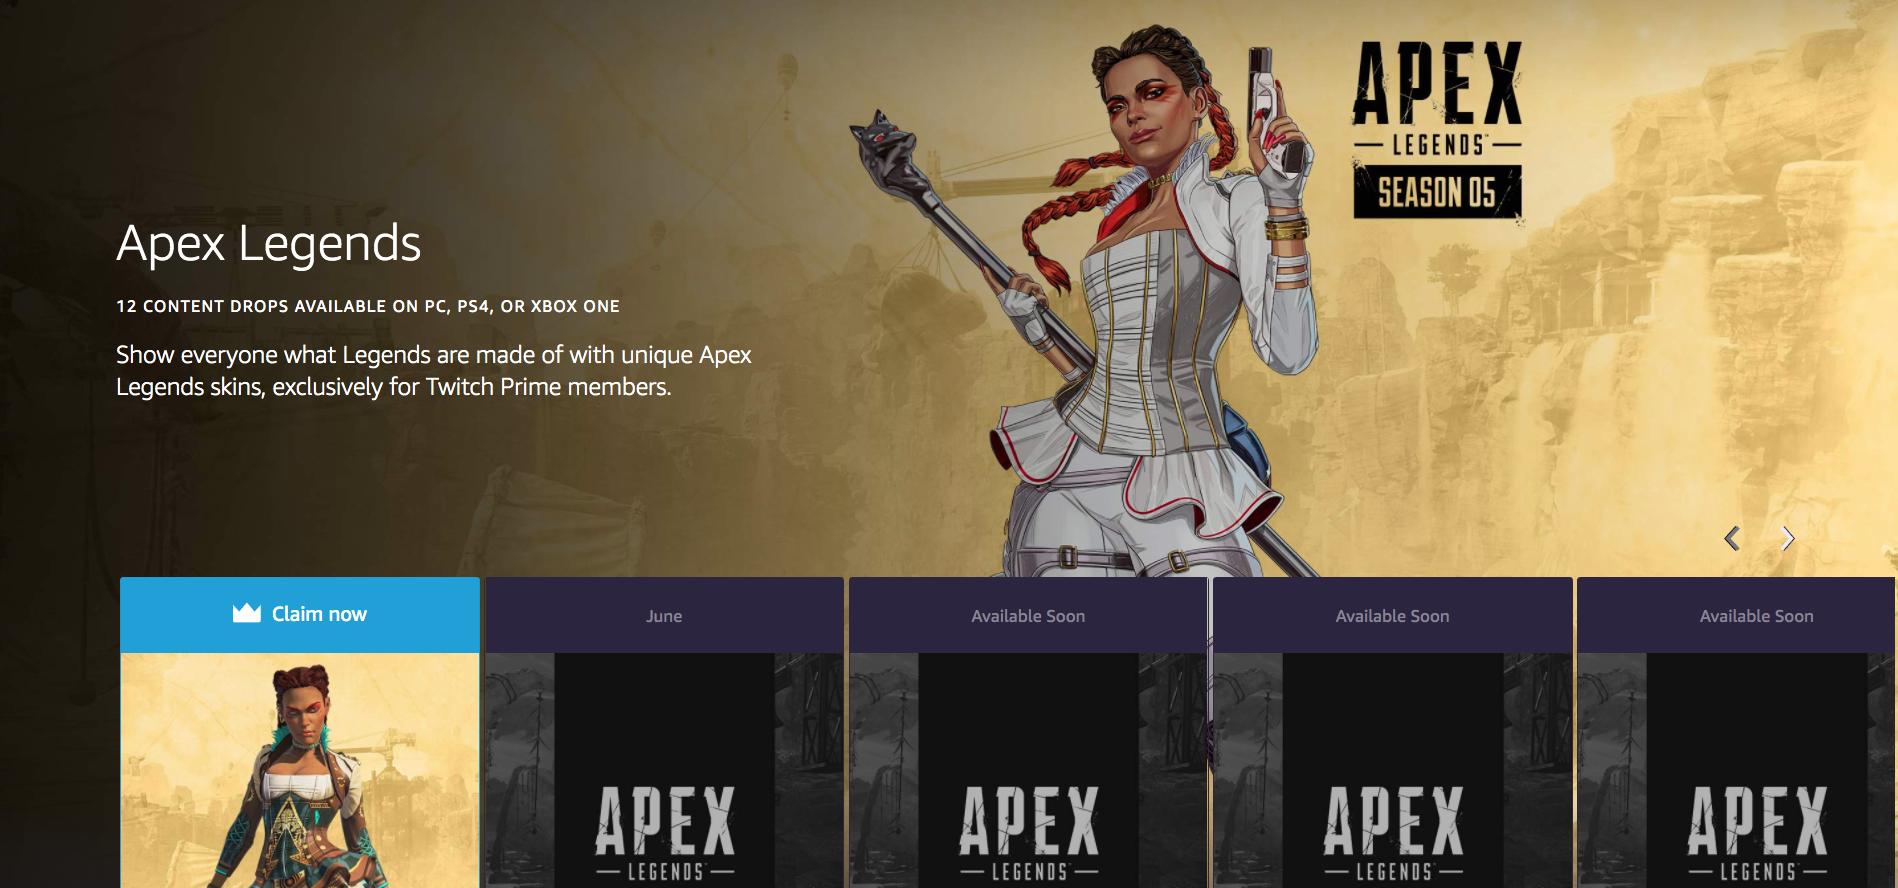 Free Apex Legends loot